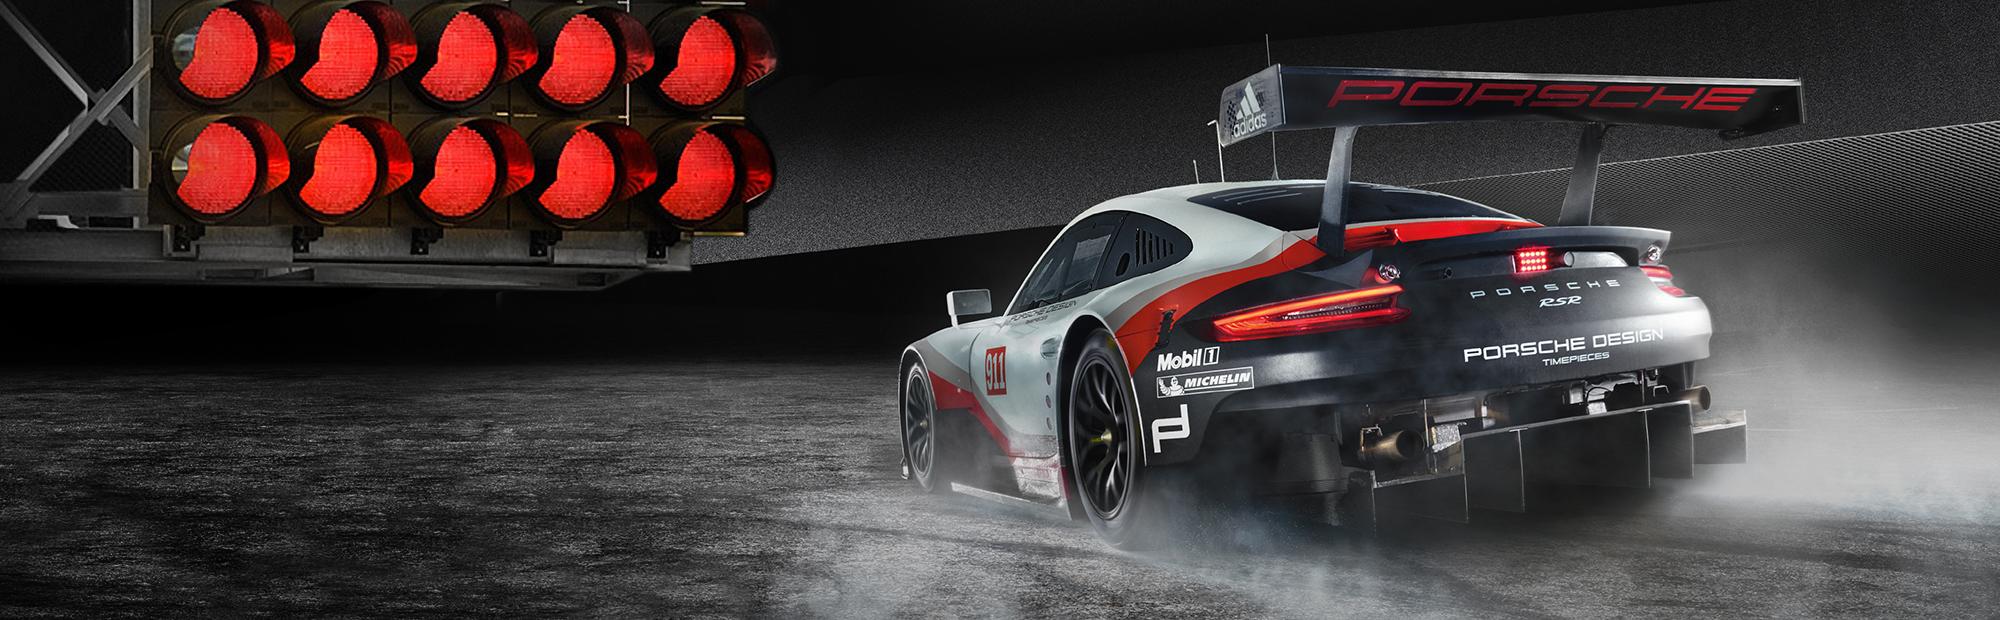 Porsche Design Macau